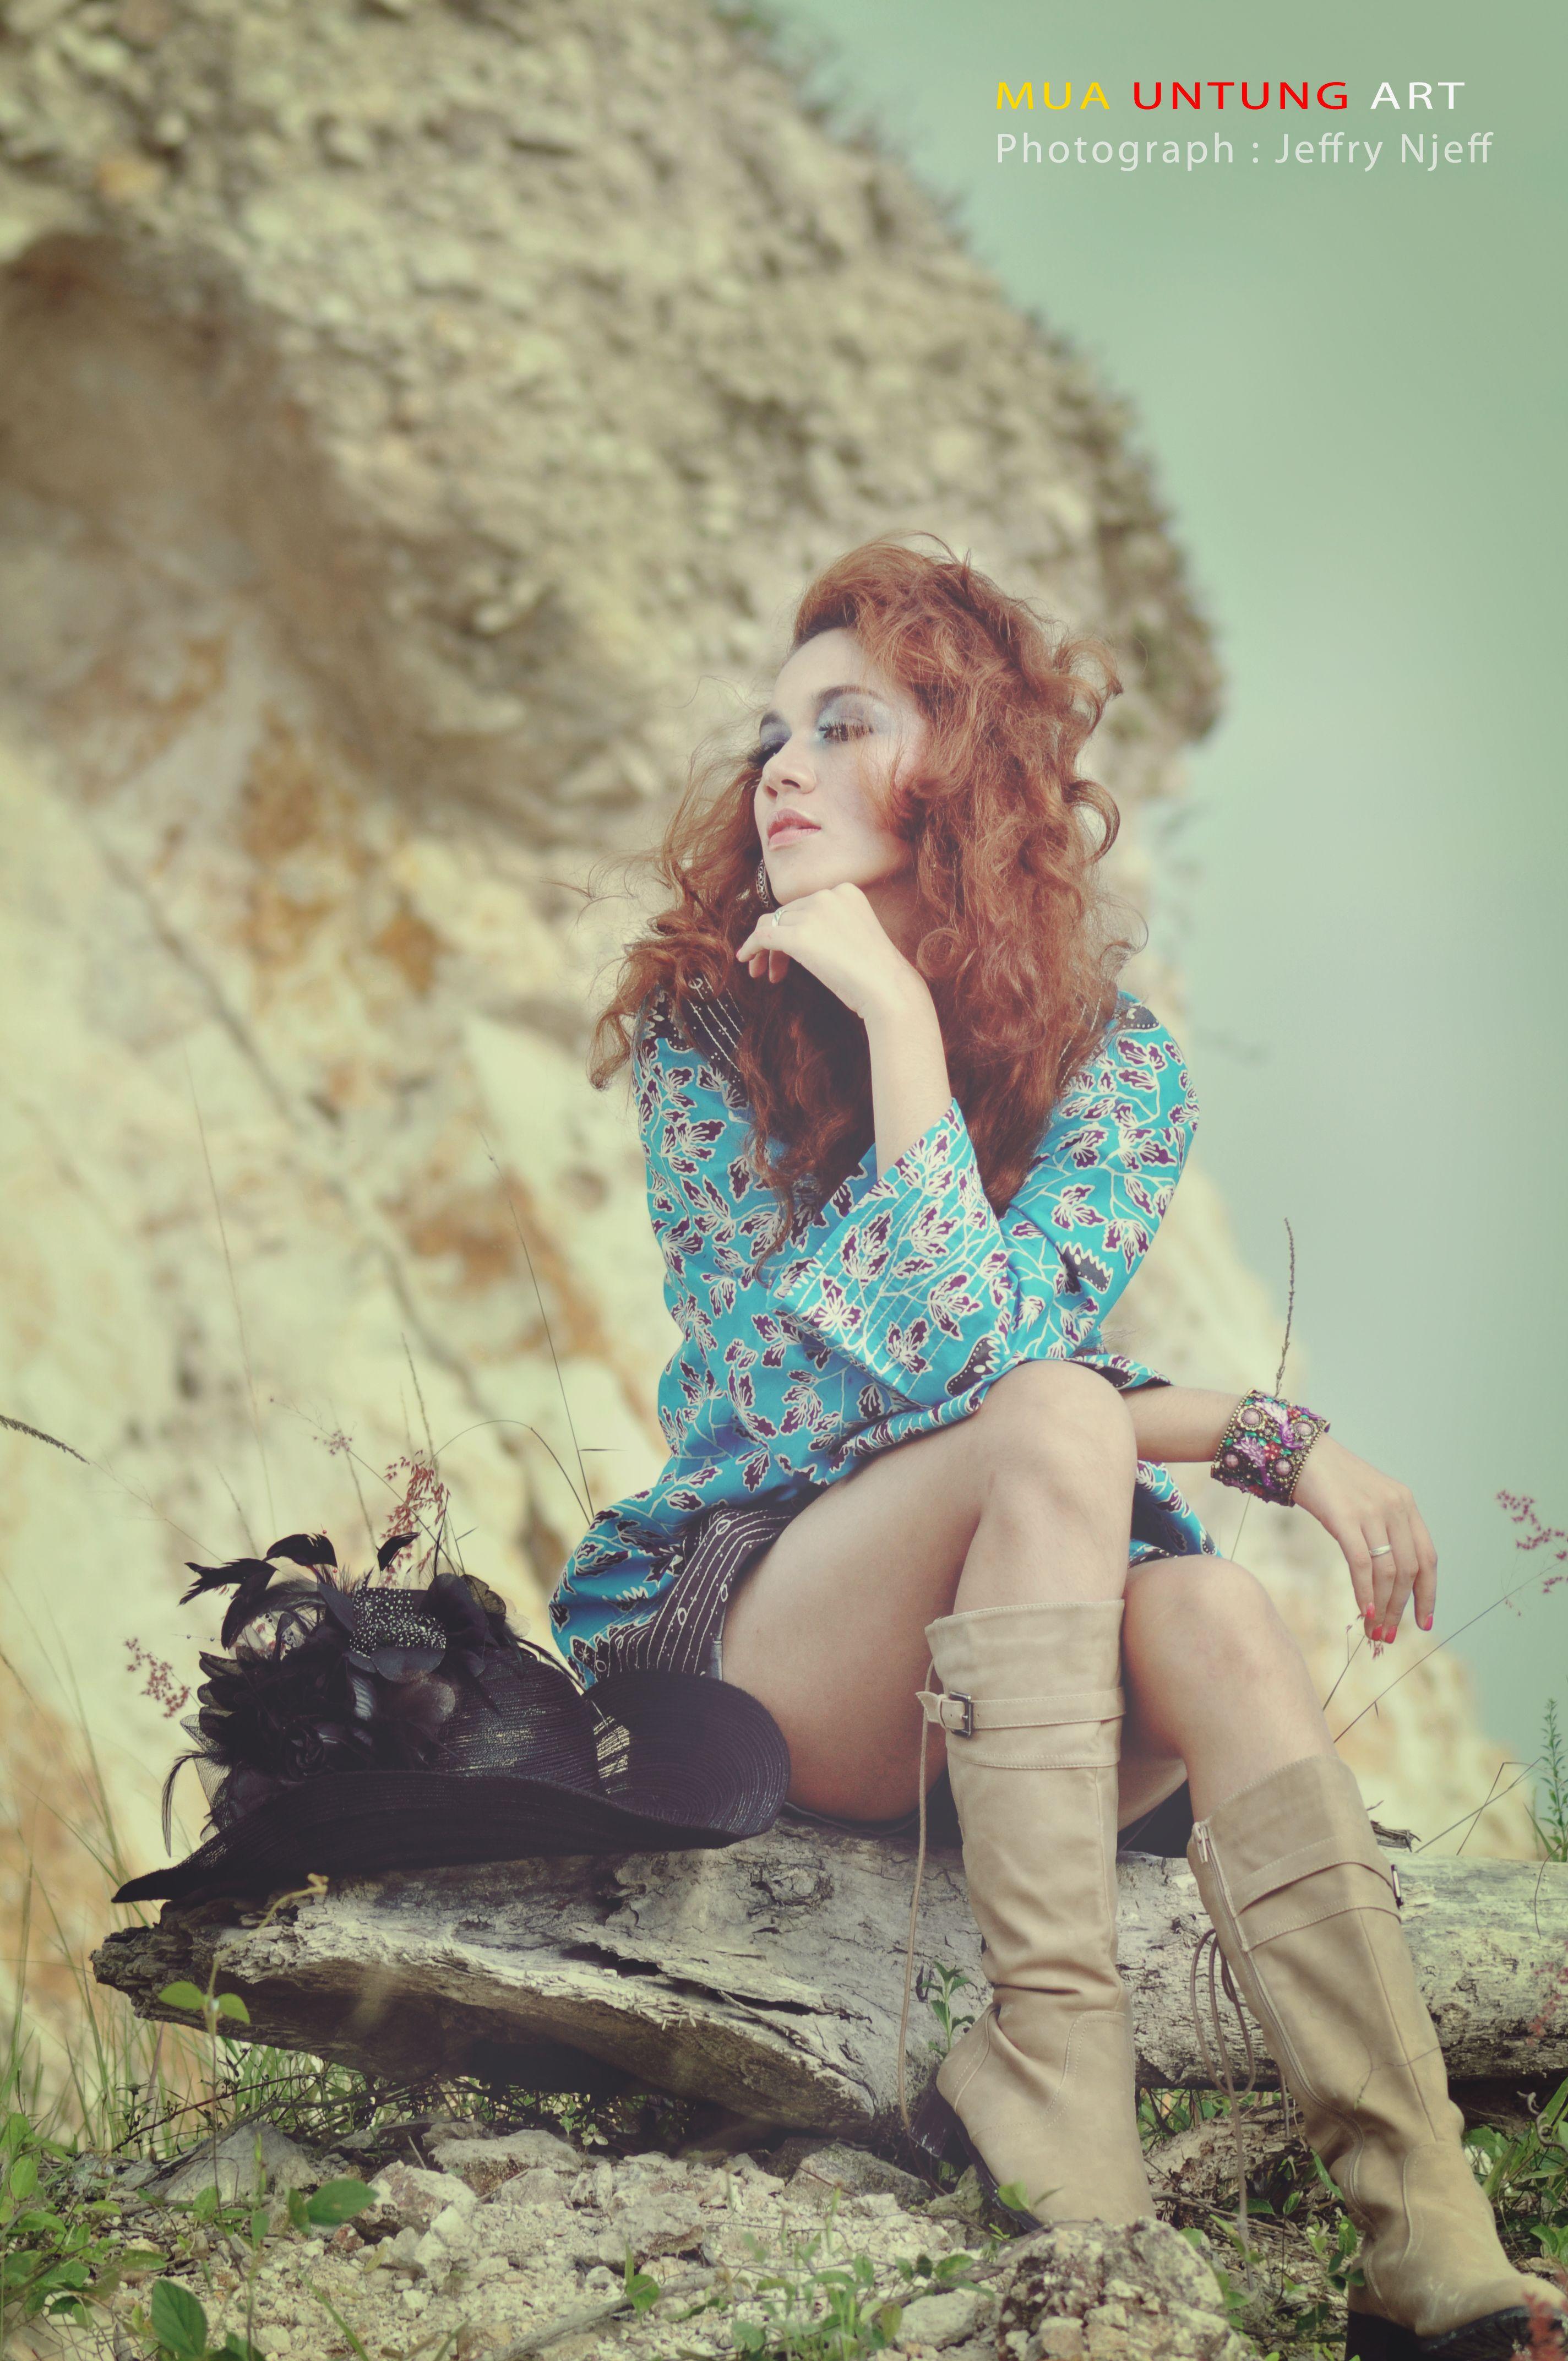 Talent : Maria Vitsentsatu Anastasius Makeup & Wardrobe by Untung Art Photo by Jeffry Junanto (Njeff)